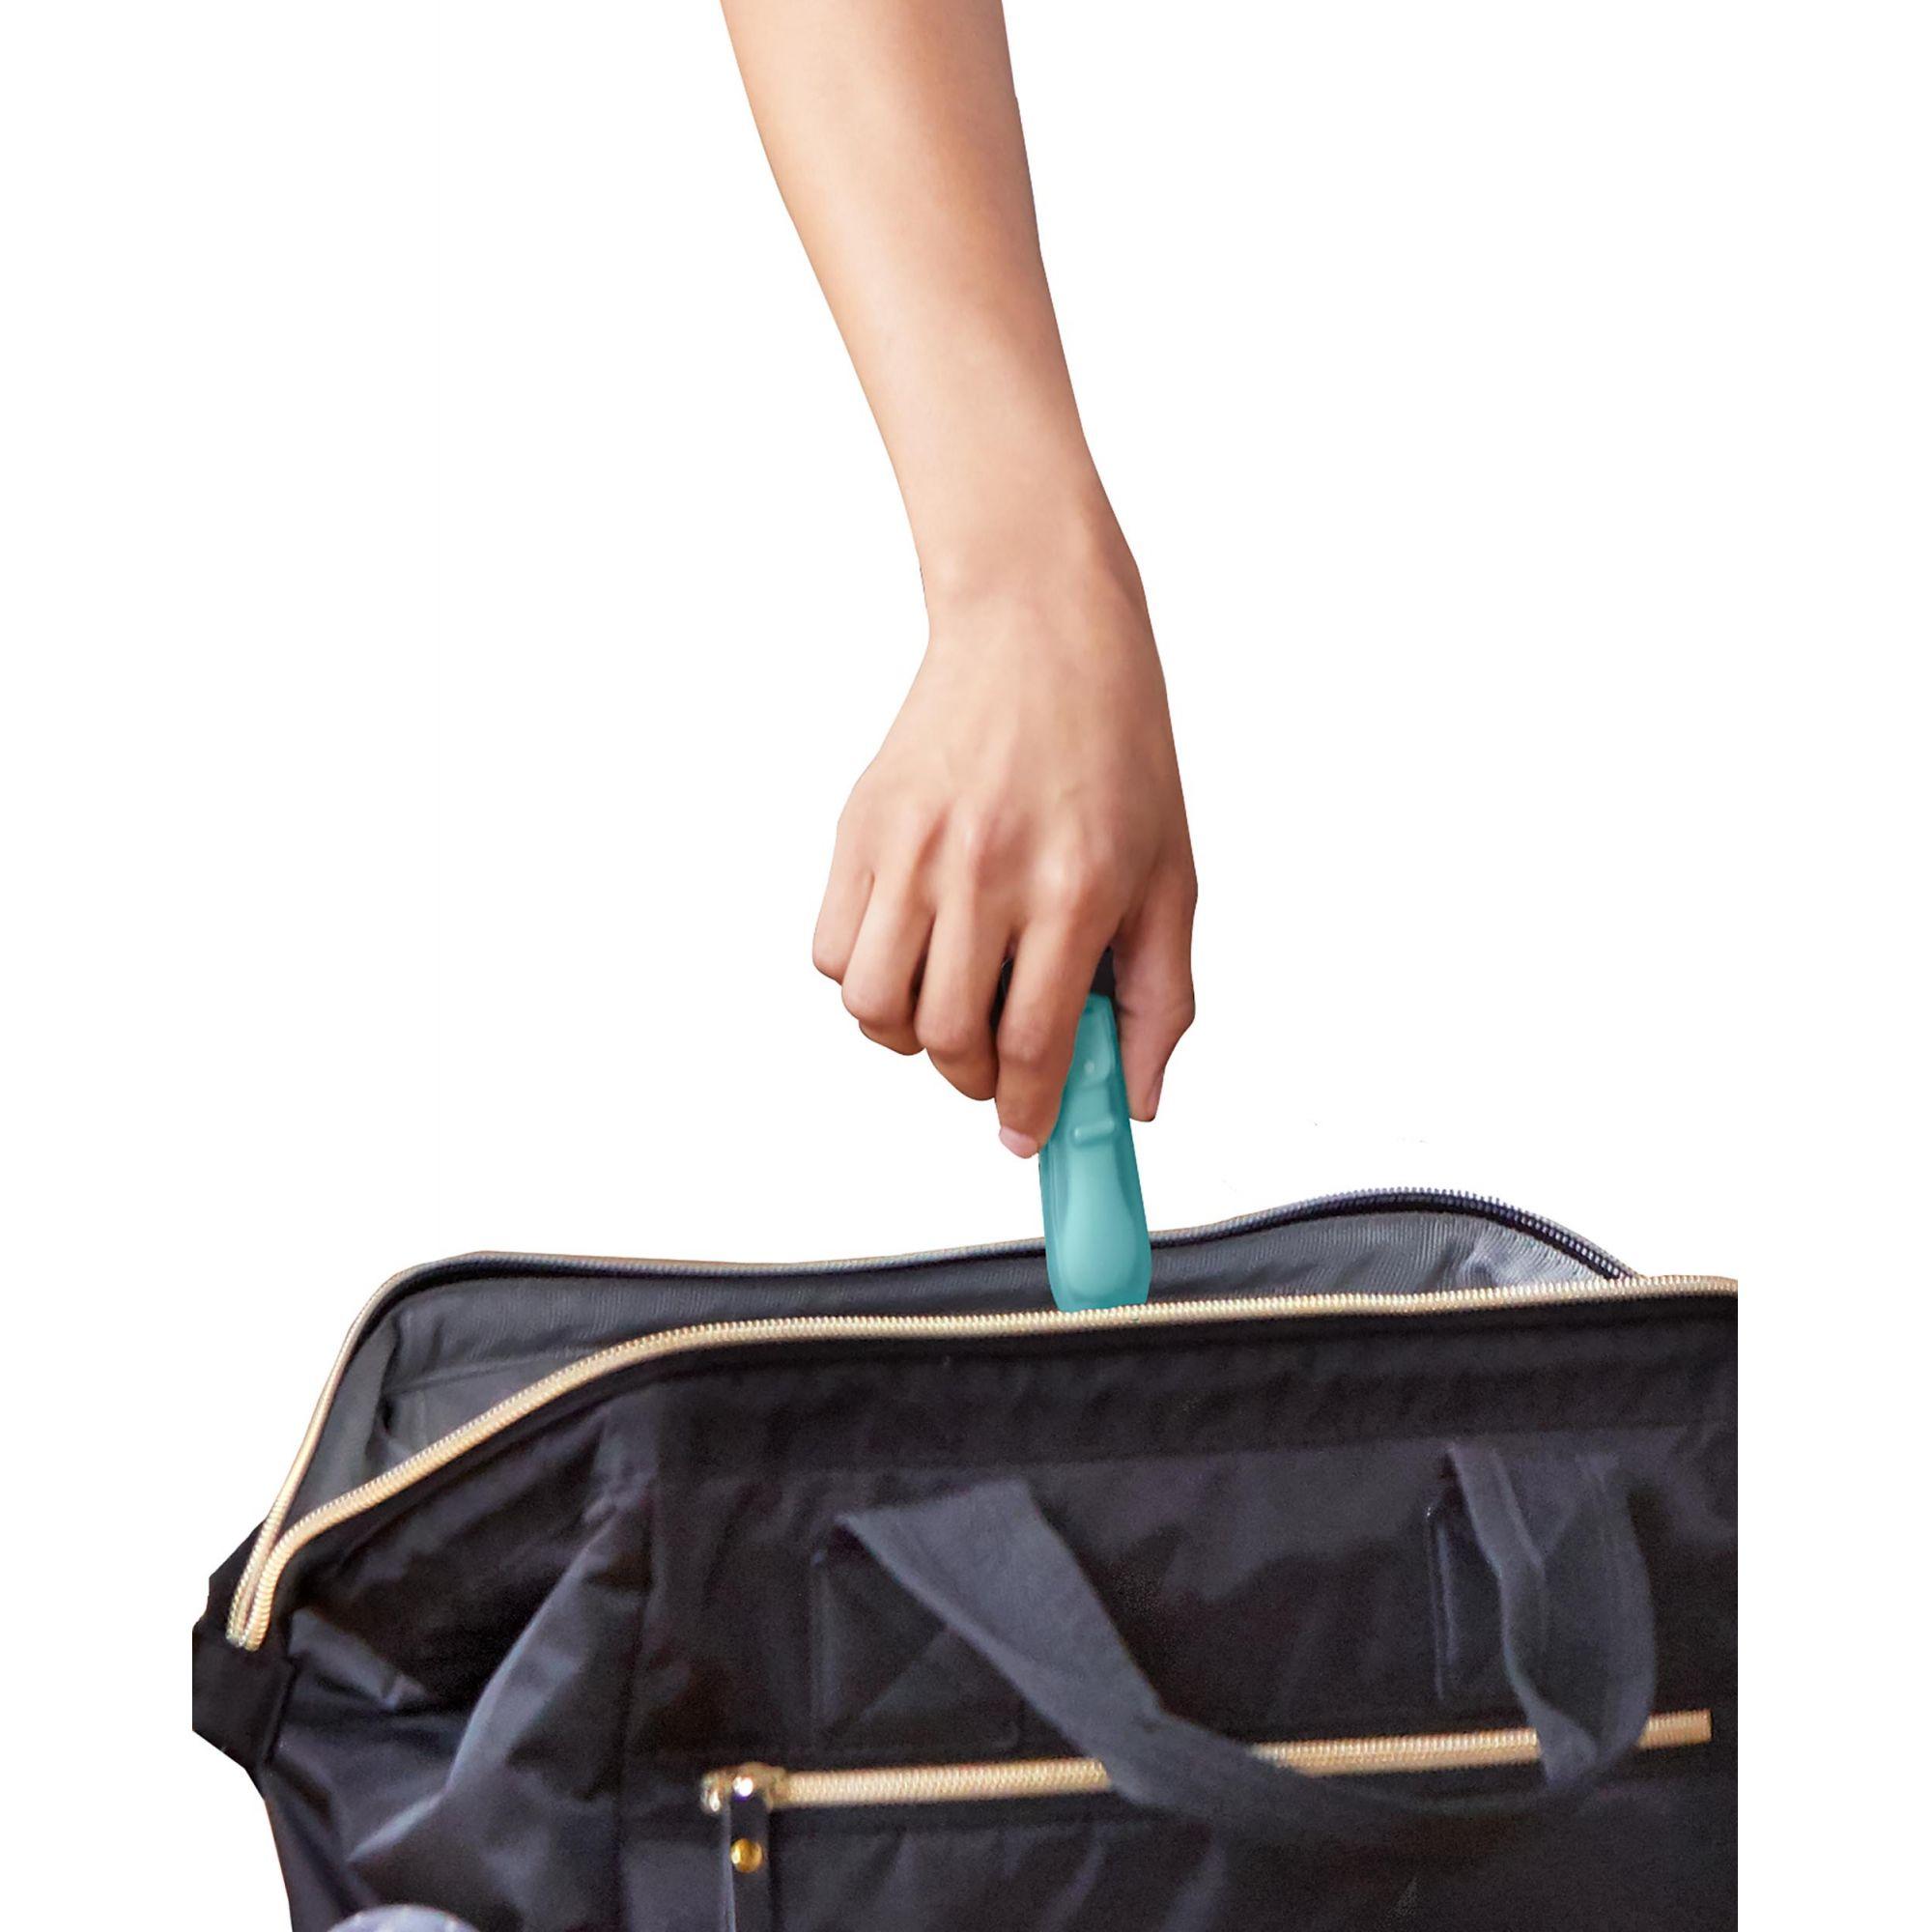 Kit colher dobrável para viagem azul - Skip Hop  - Kaiuru Kids